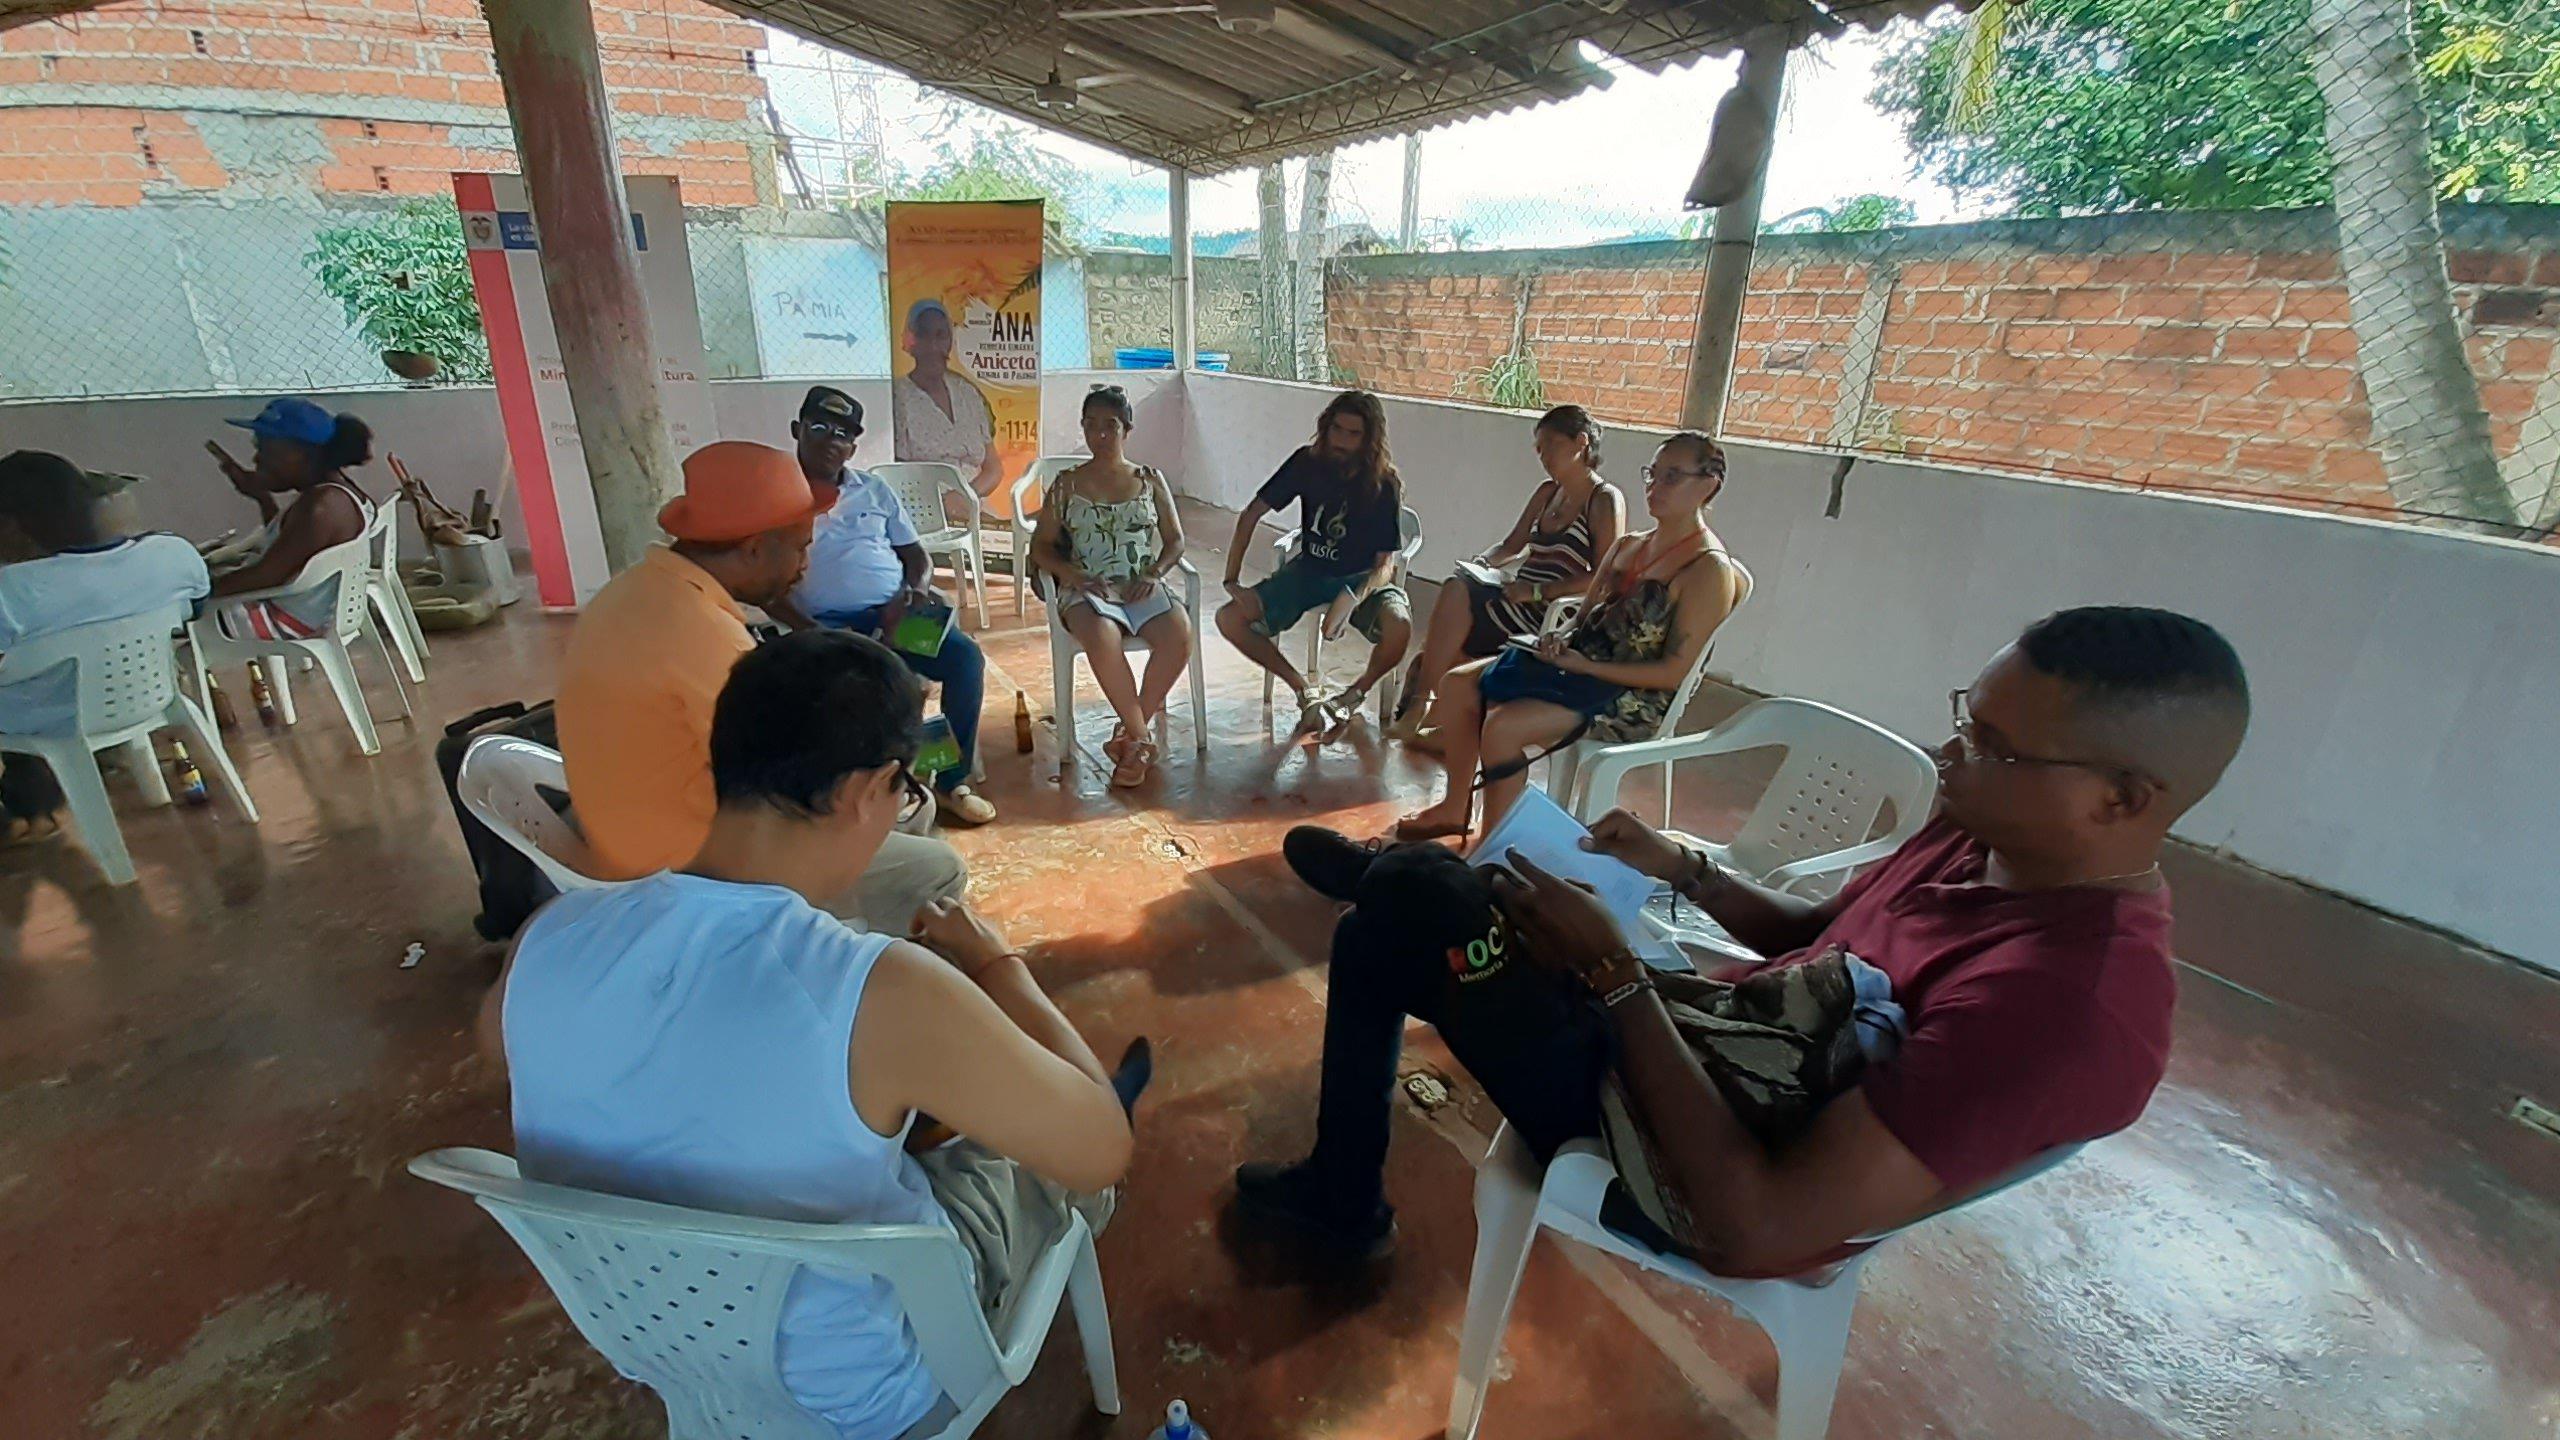 MA KOMBILESA RI PALENGE A MINIMO A MA TRÓPIKO LOS AMIGOS DE PALENQUE VIENEN AL TROPICO - 20191012_153303